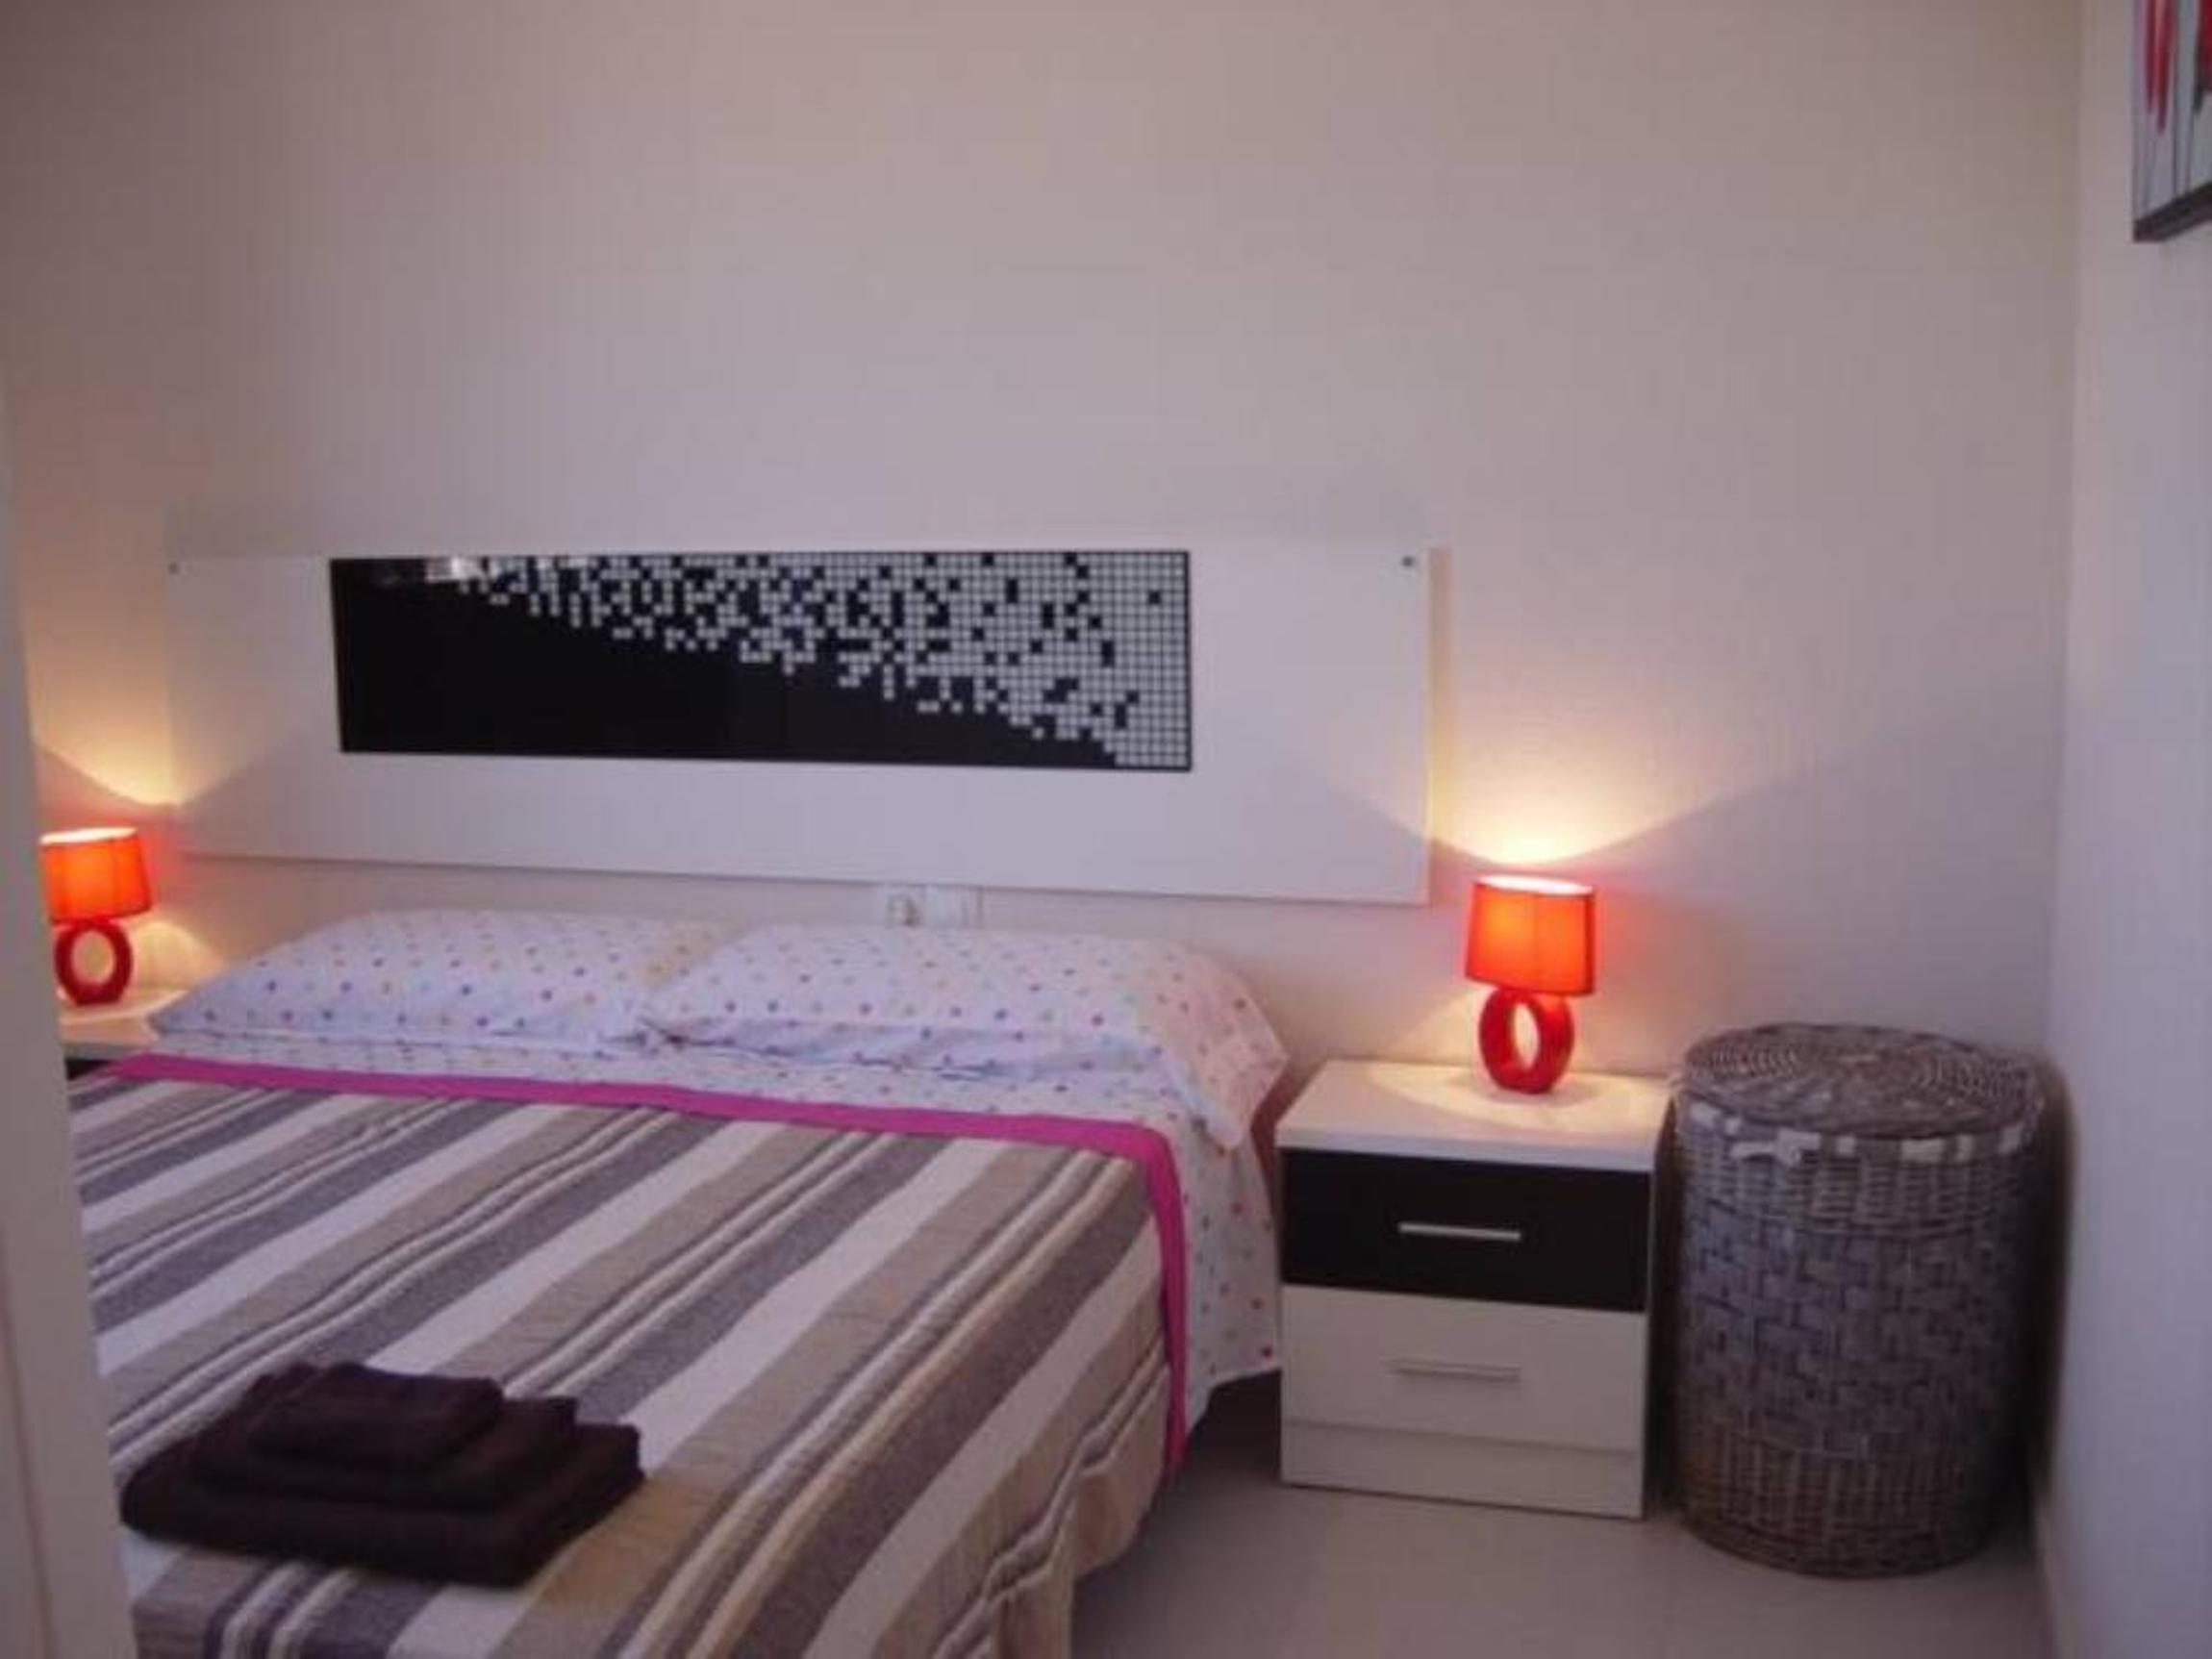 Ferienwohnung Wohnung El Mirador -Residencial Las Dunas - (2196686), Corralejo, Fuerteventura, Kanarische Inseln, Spanien, Bild 7